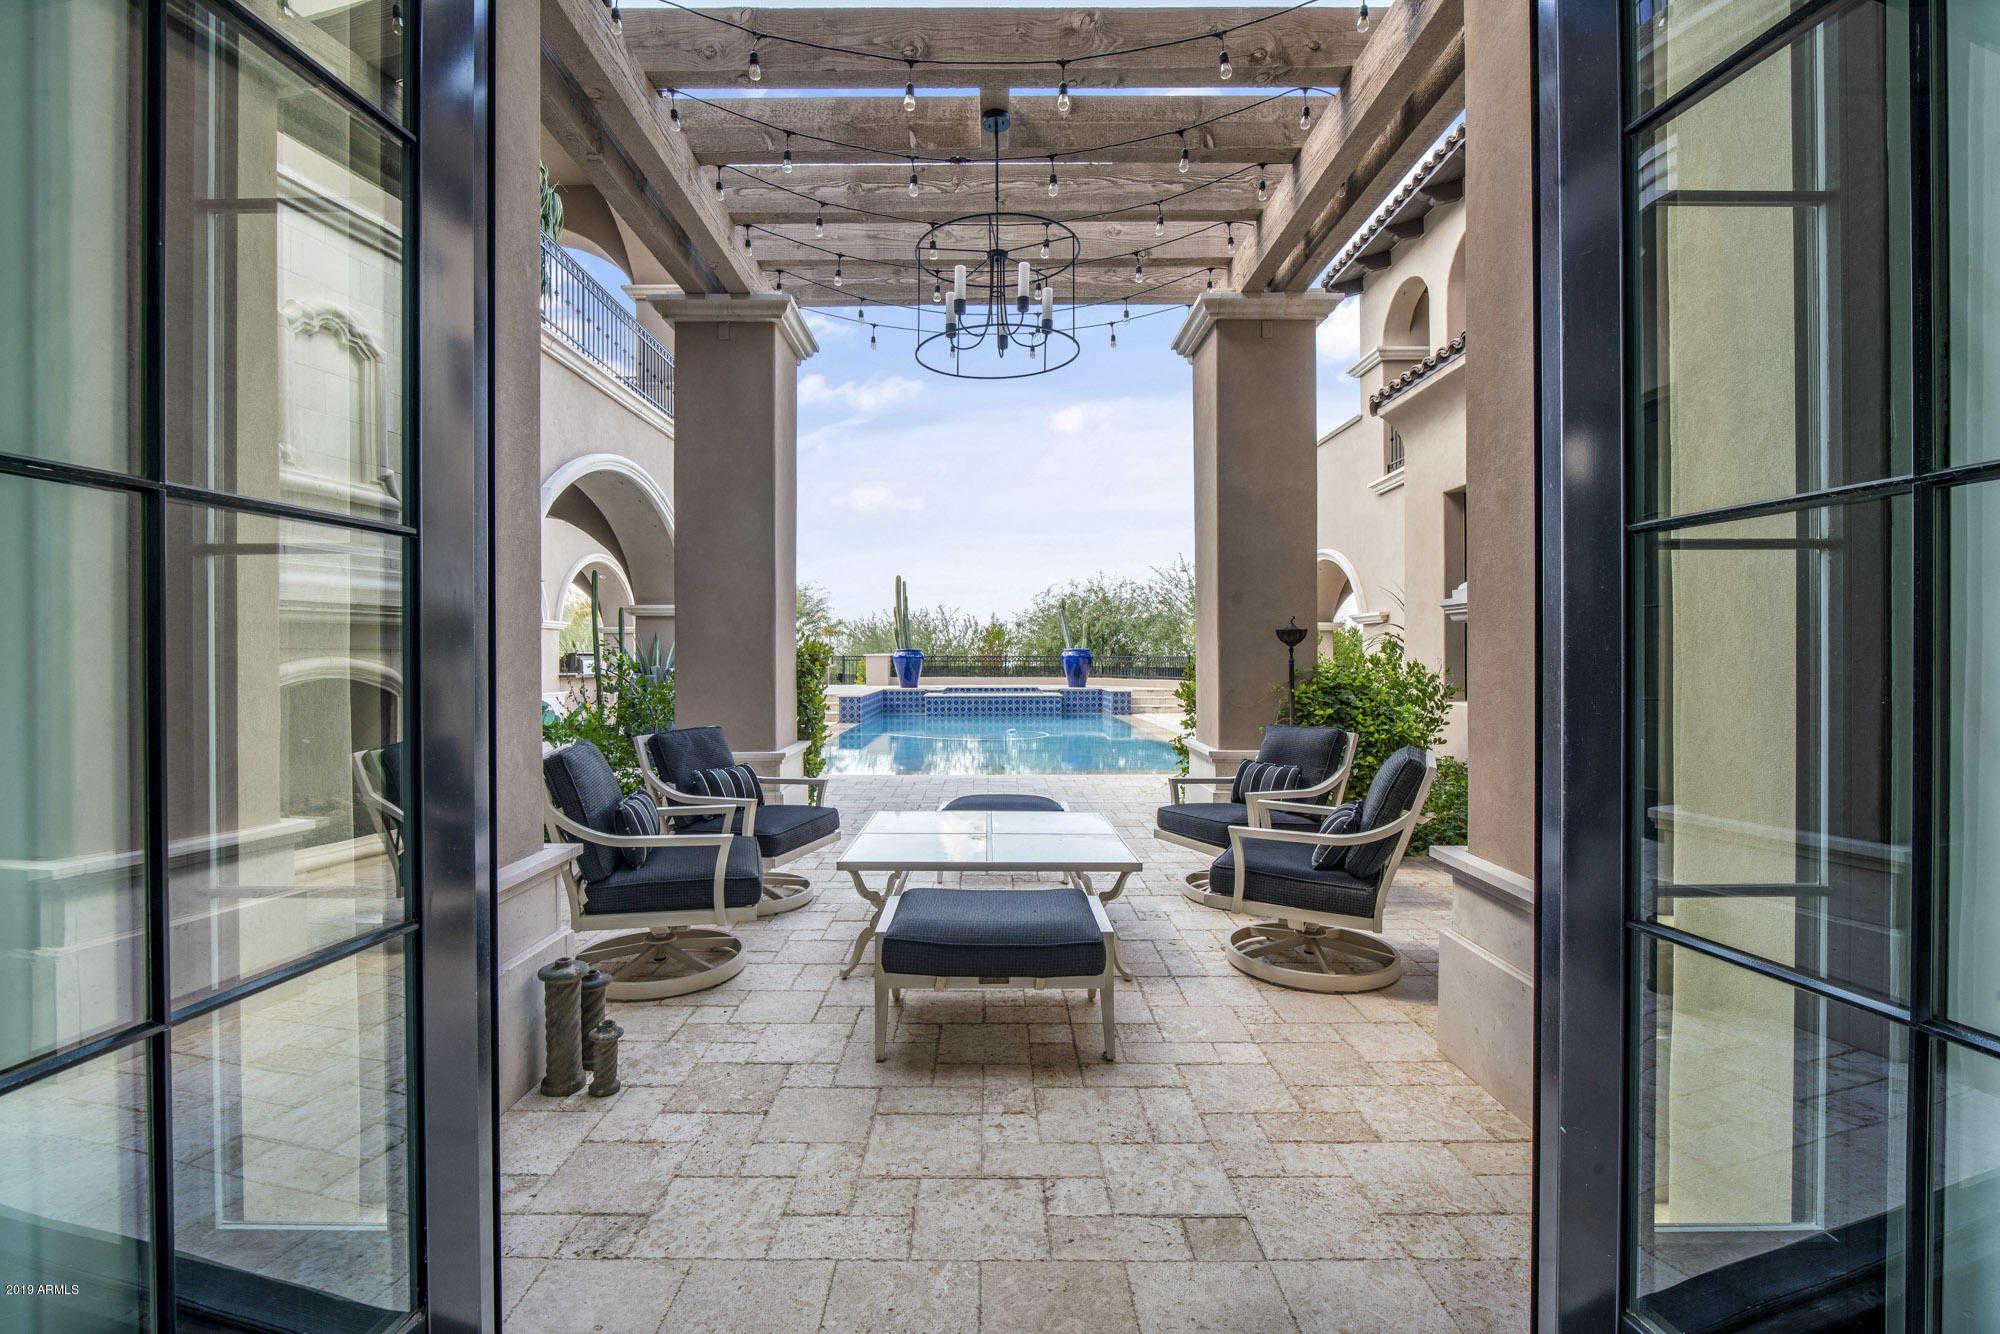 $8,500,000 - 6Br/8Ba - Home for Sale in Silverleaf, Scottsdale